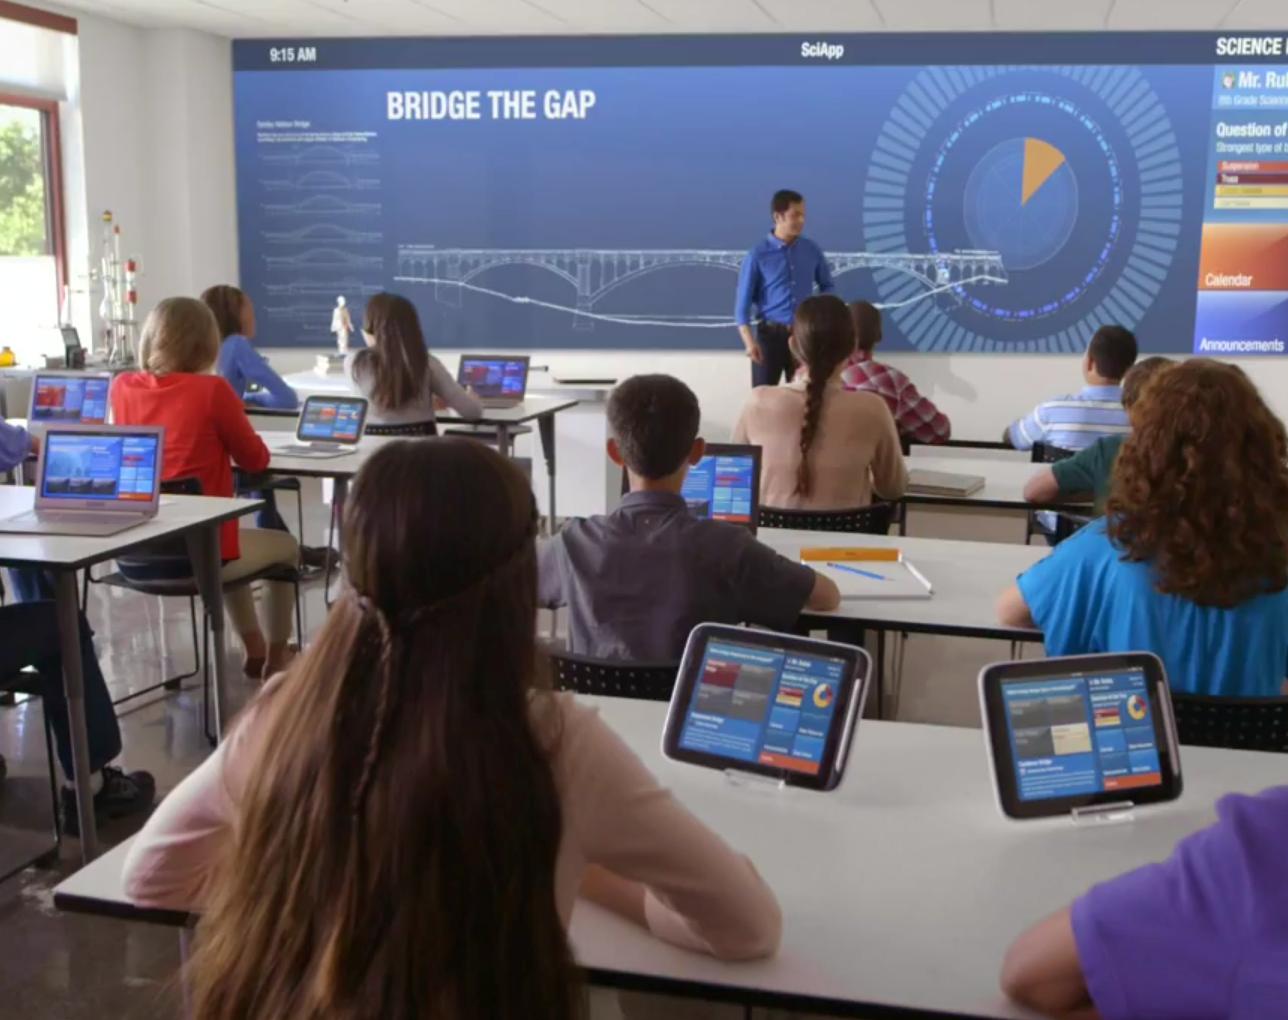 802.11ac classroom technology